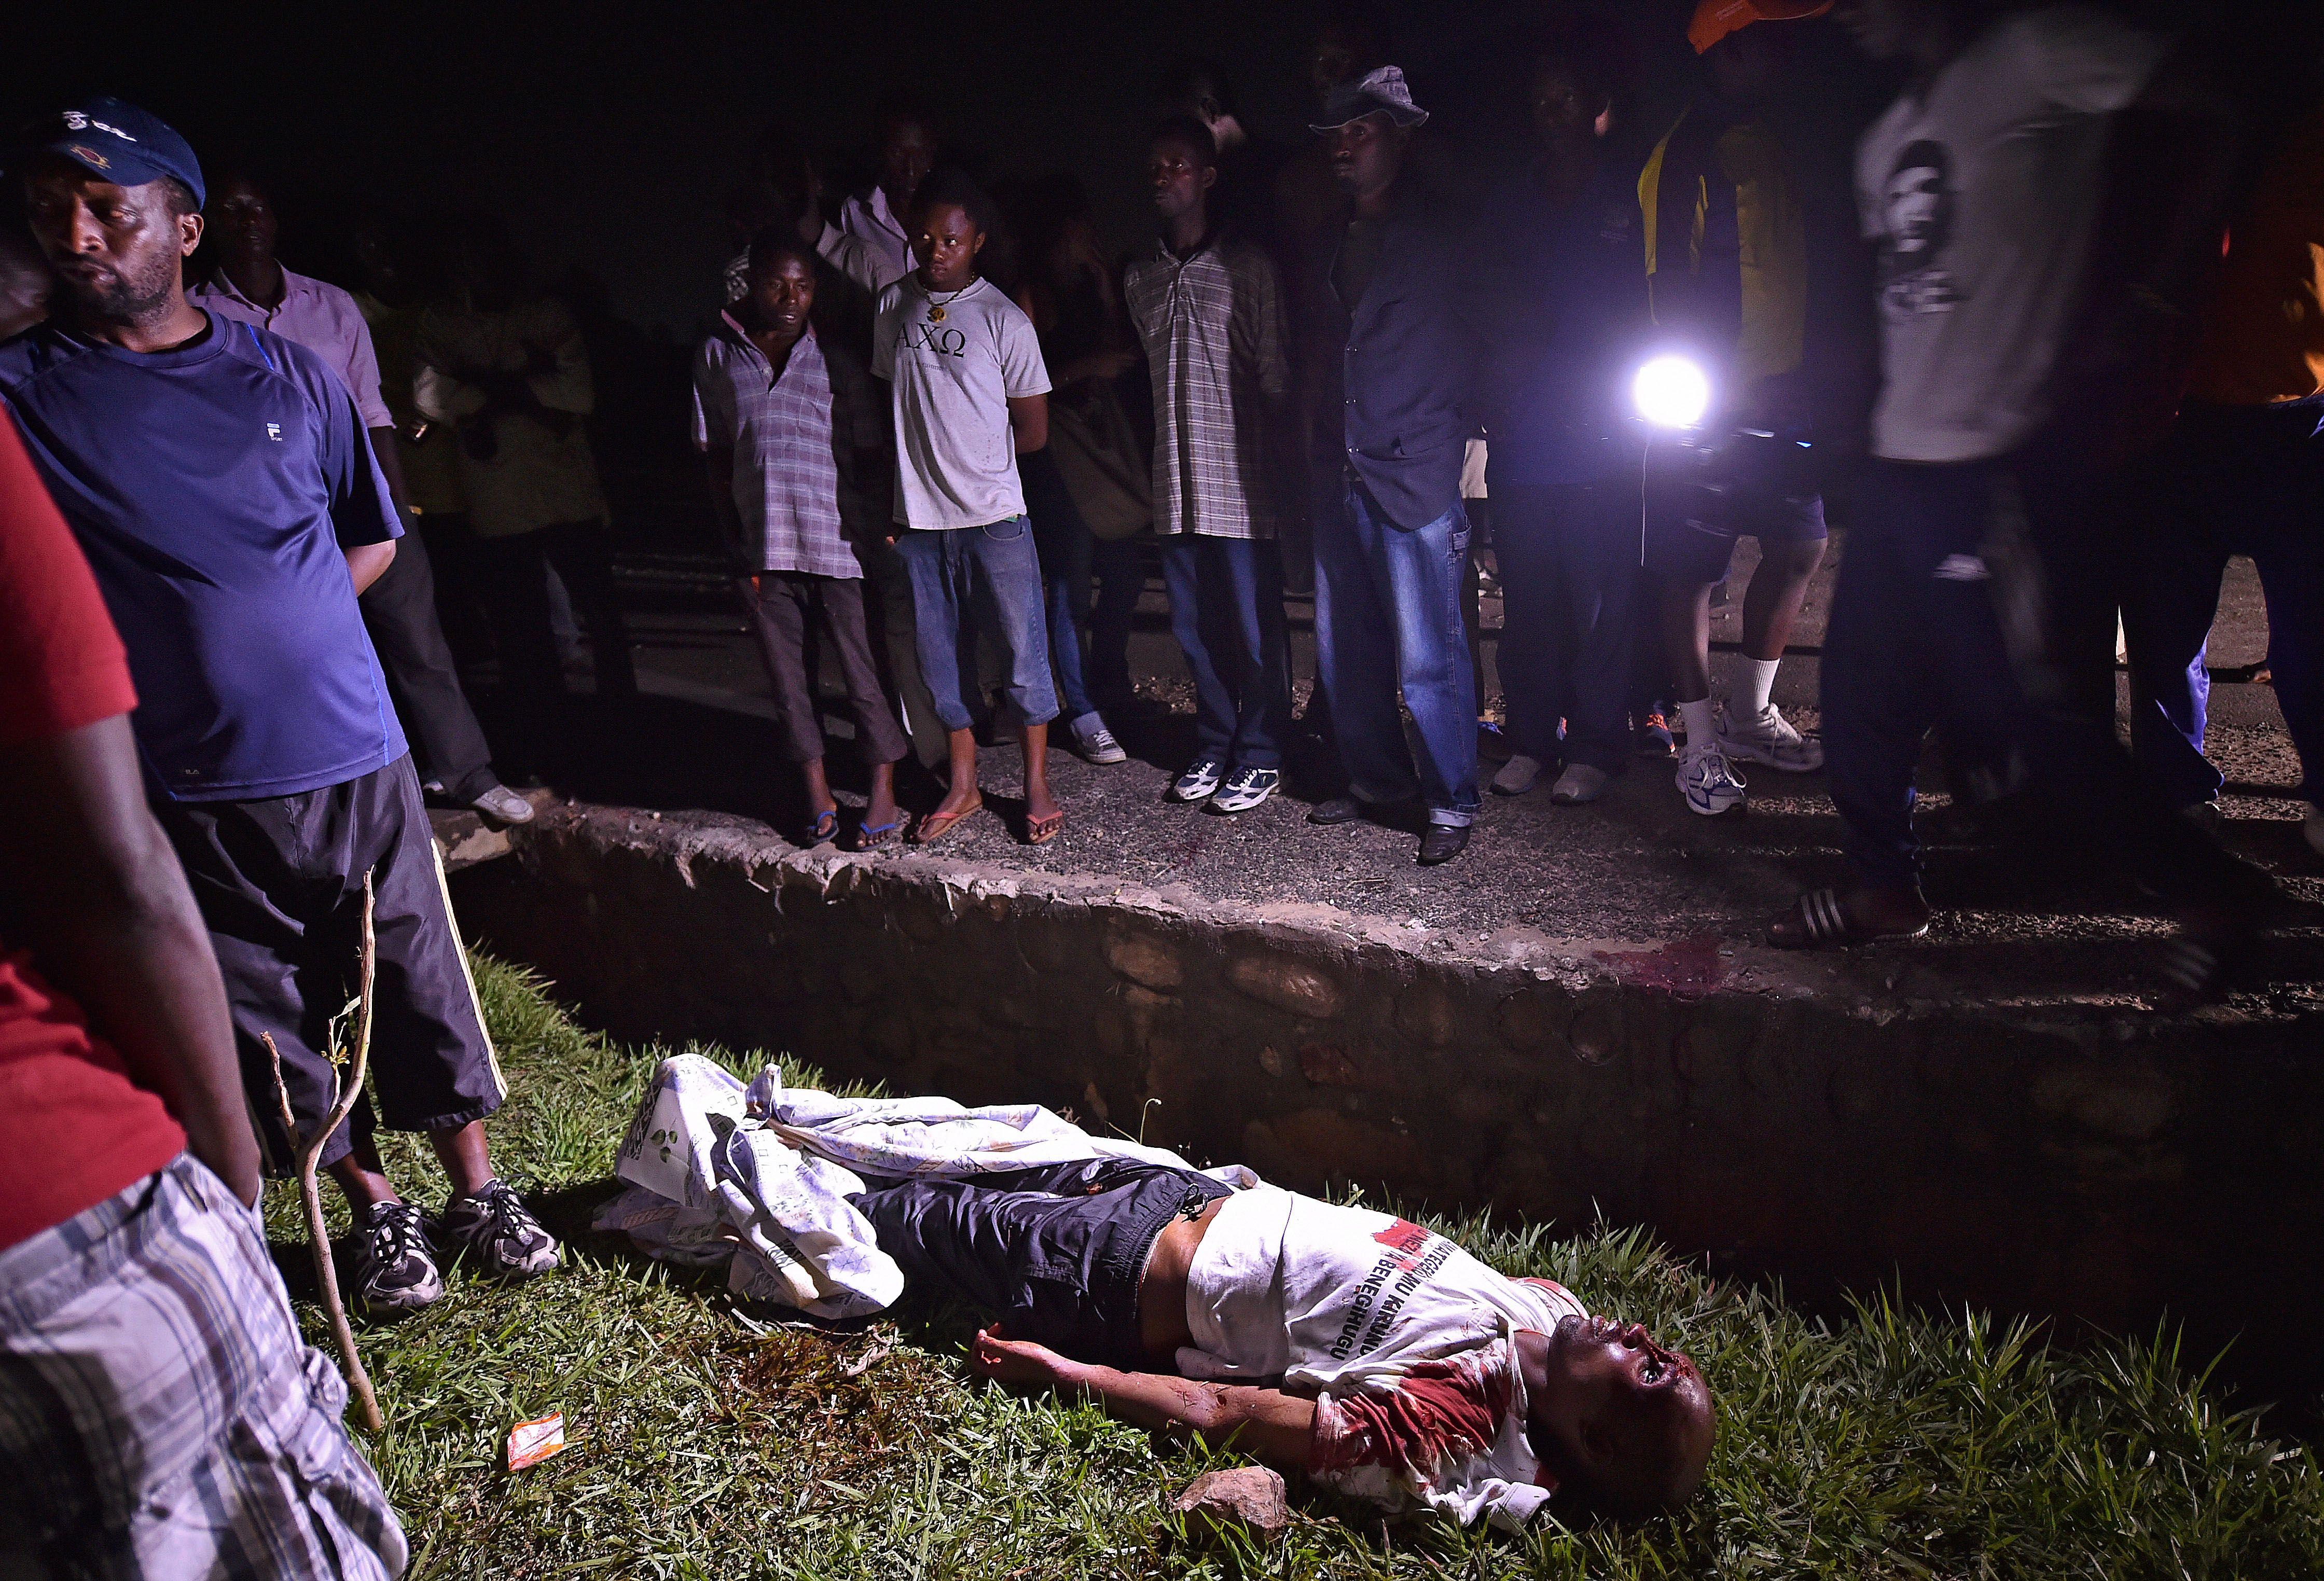 Zedi foi morto junto de seu segurança / Carl De Souza/AFP